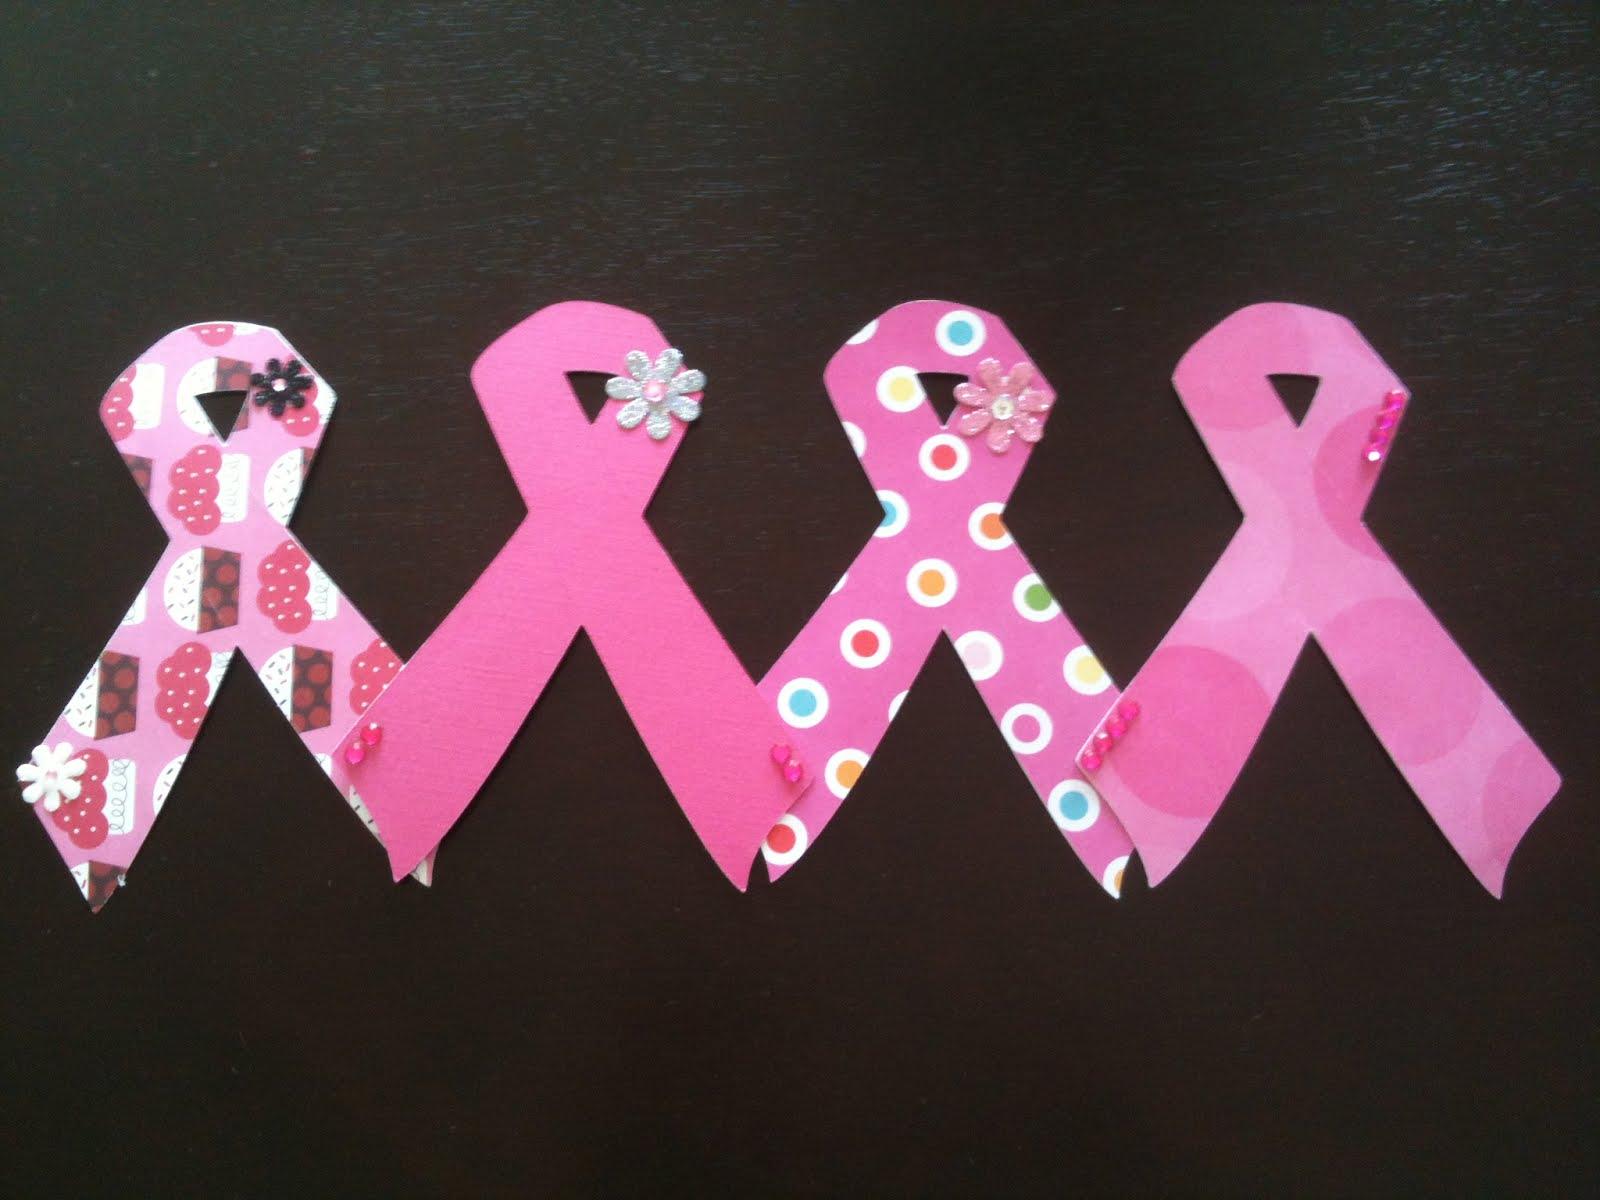 Breast Cancer 3d Wallpaper For Pc Hd Breast Cancer Backgrounds Pixelstalk Net